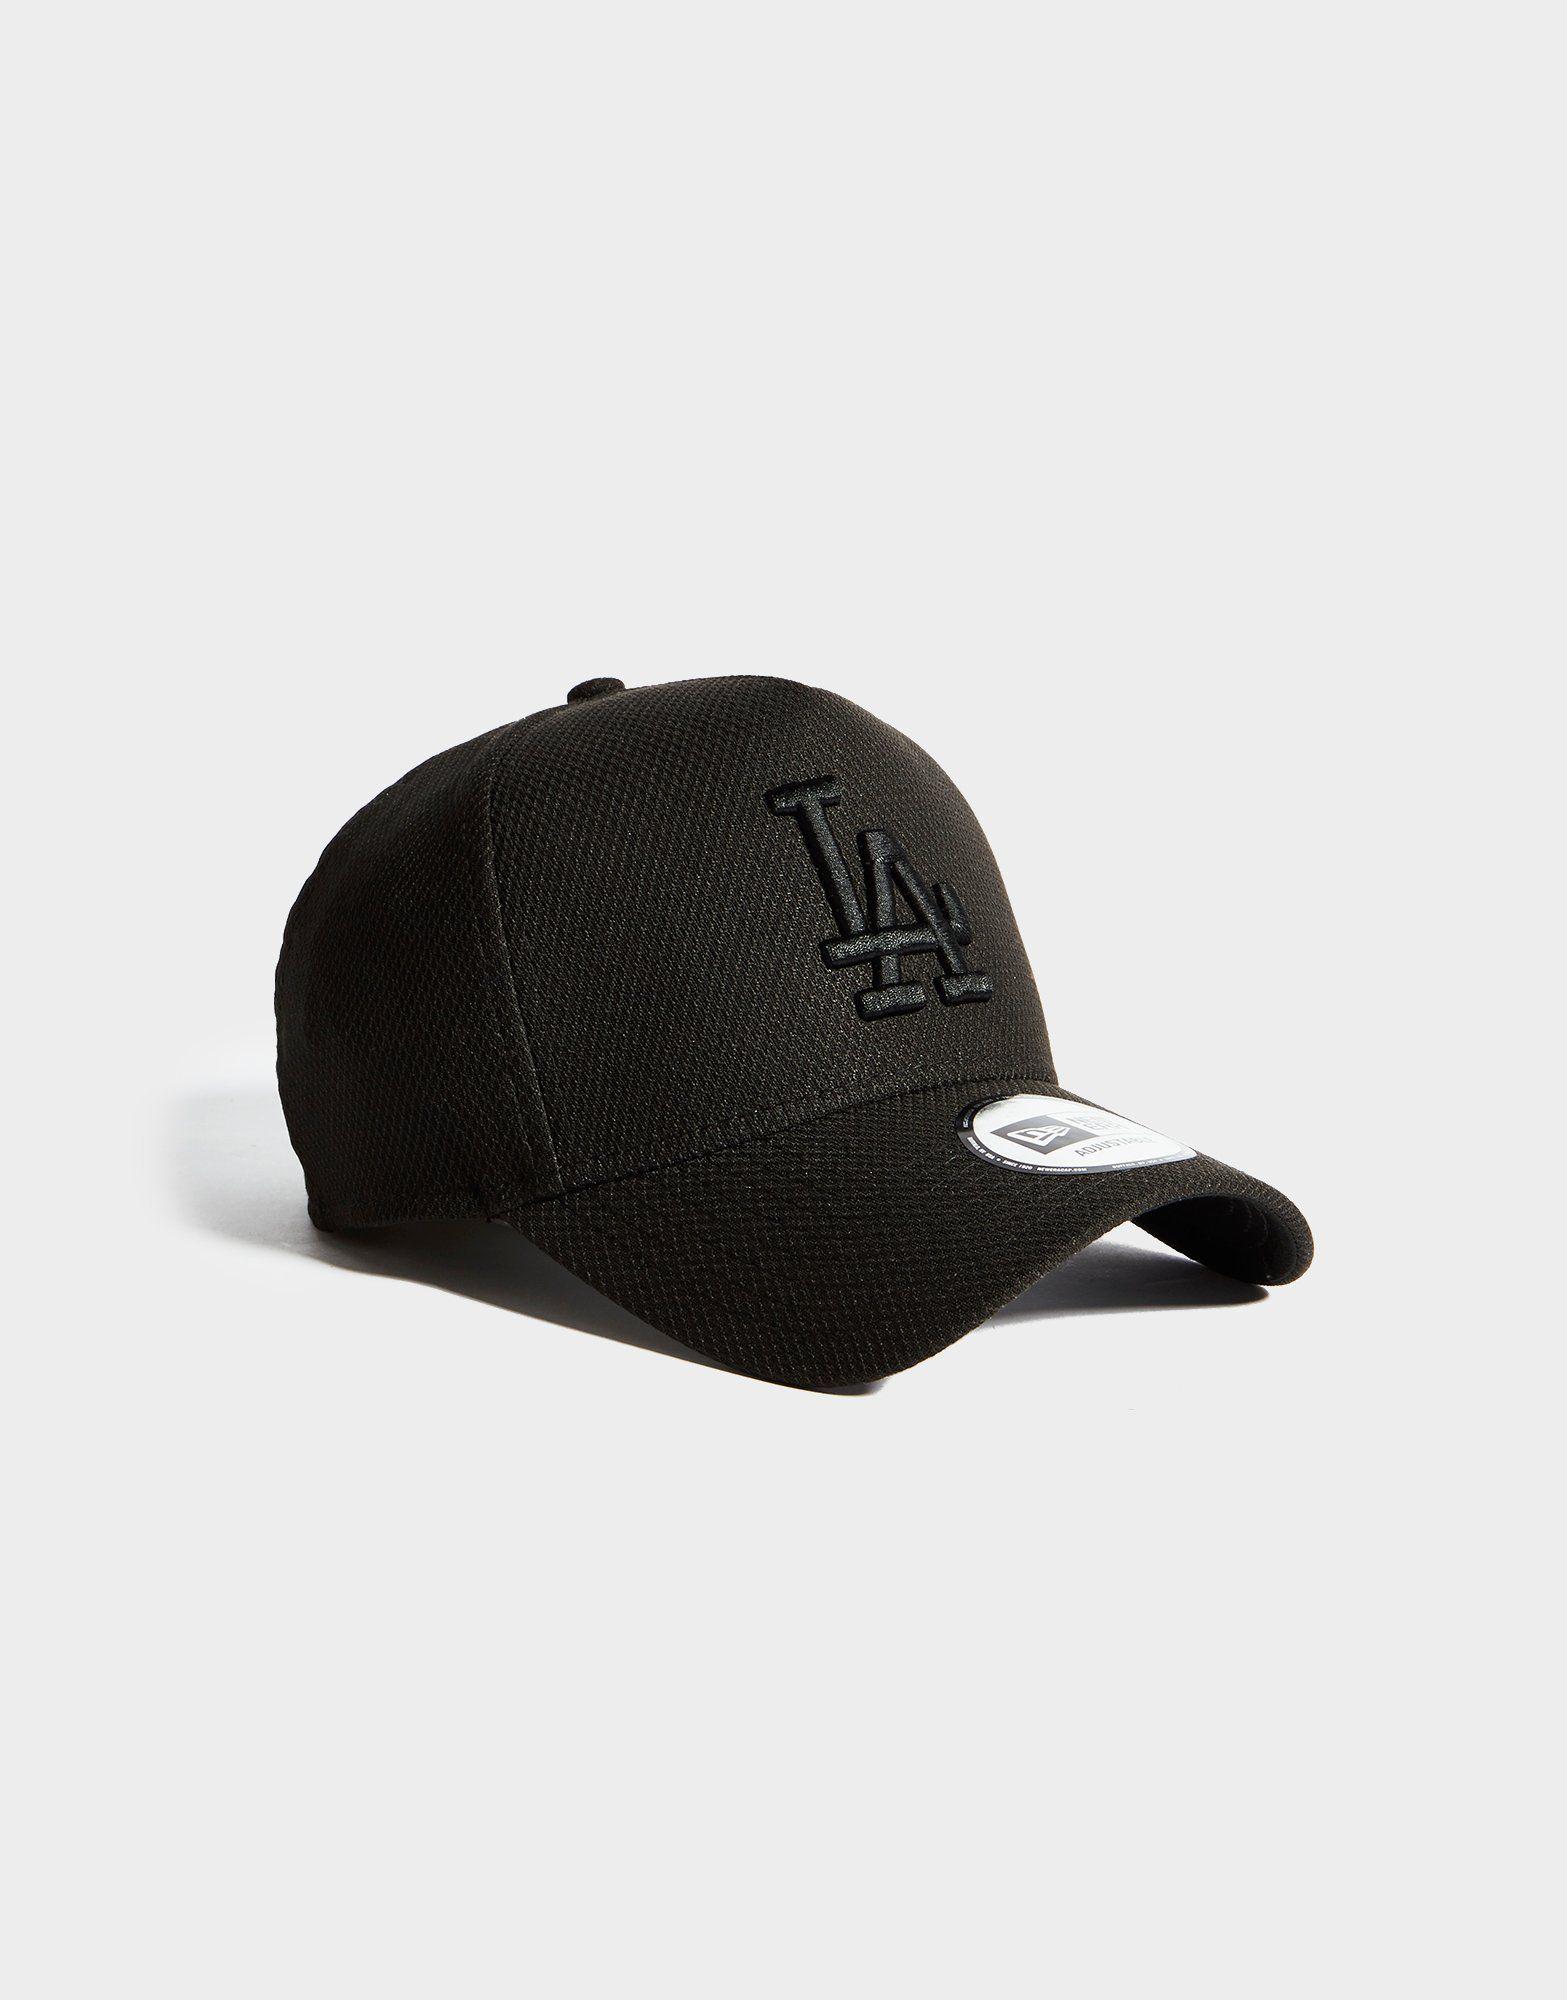 603fb901e03 New Era MLB A Frame Los Angeles Dodgers Diamond Era Cap